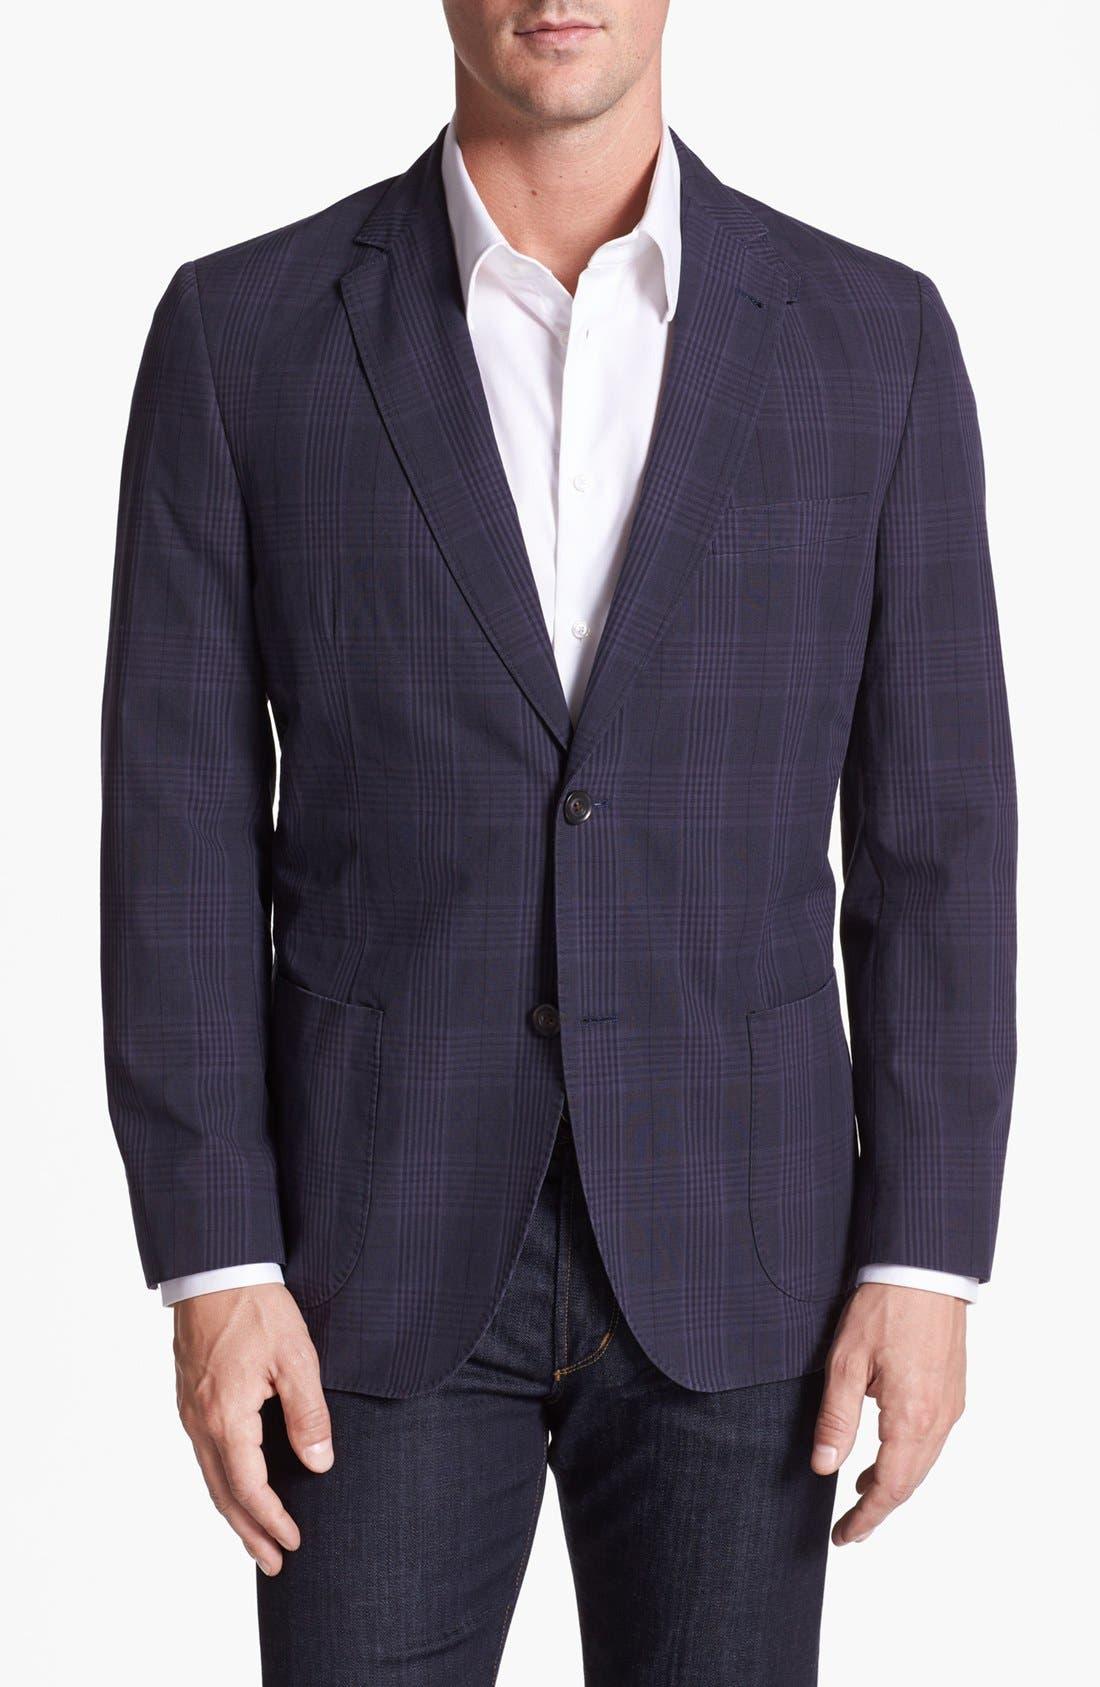 Alternate Image 1 Selected - Kroon Cotton Linen Blend Sportcoat